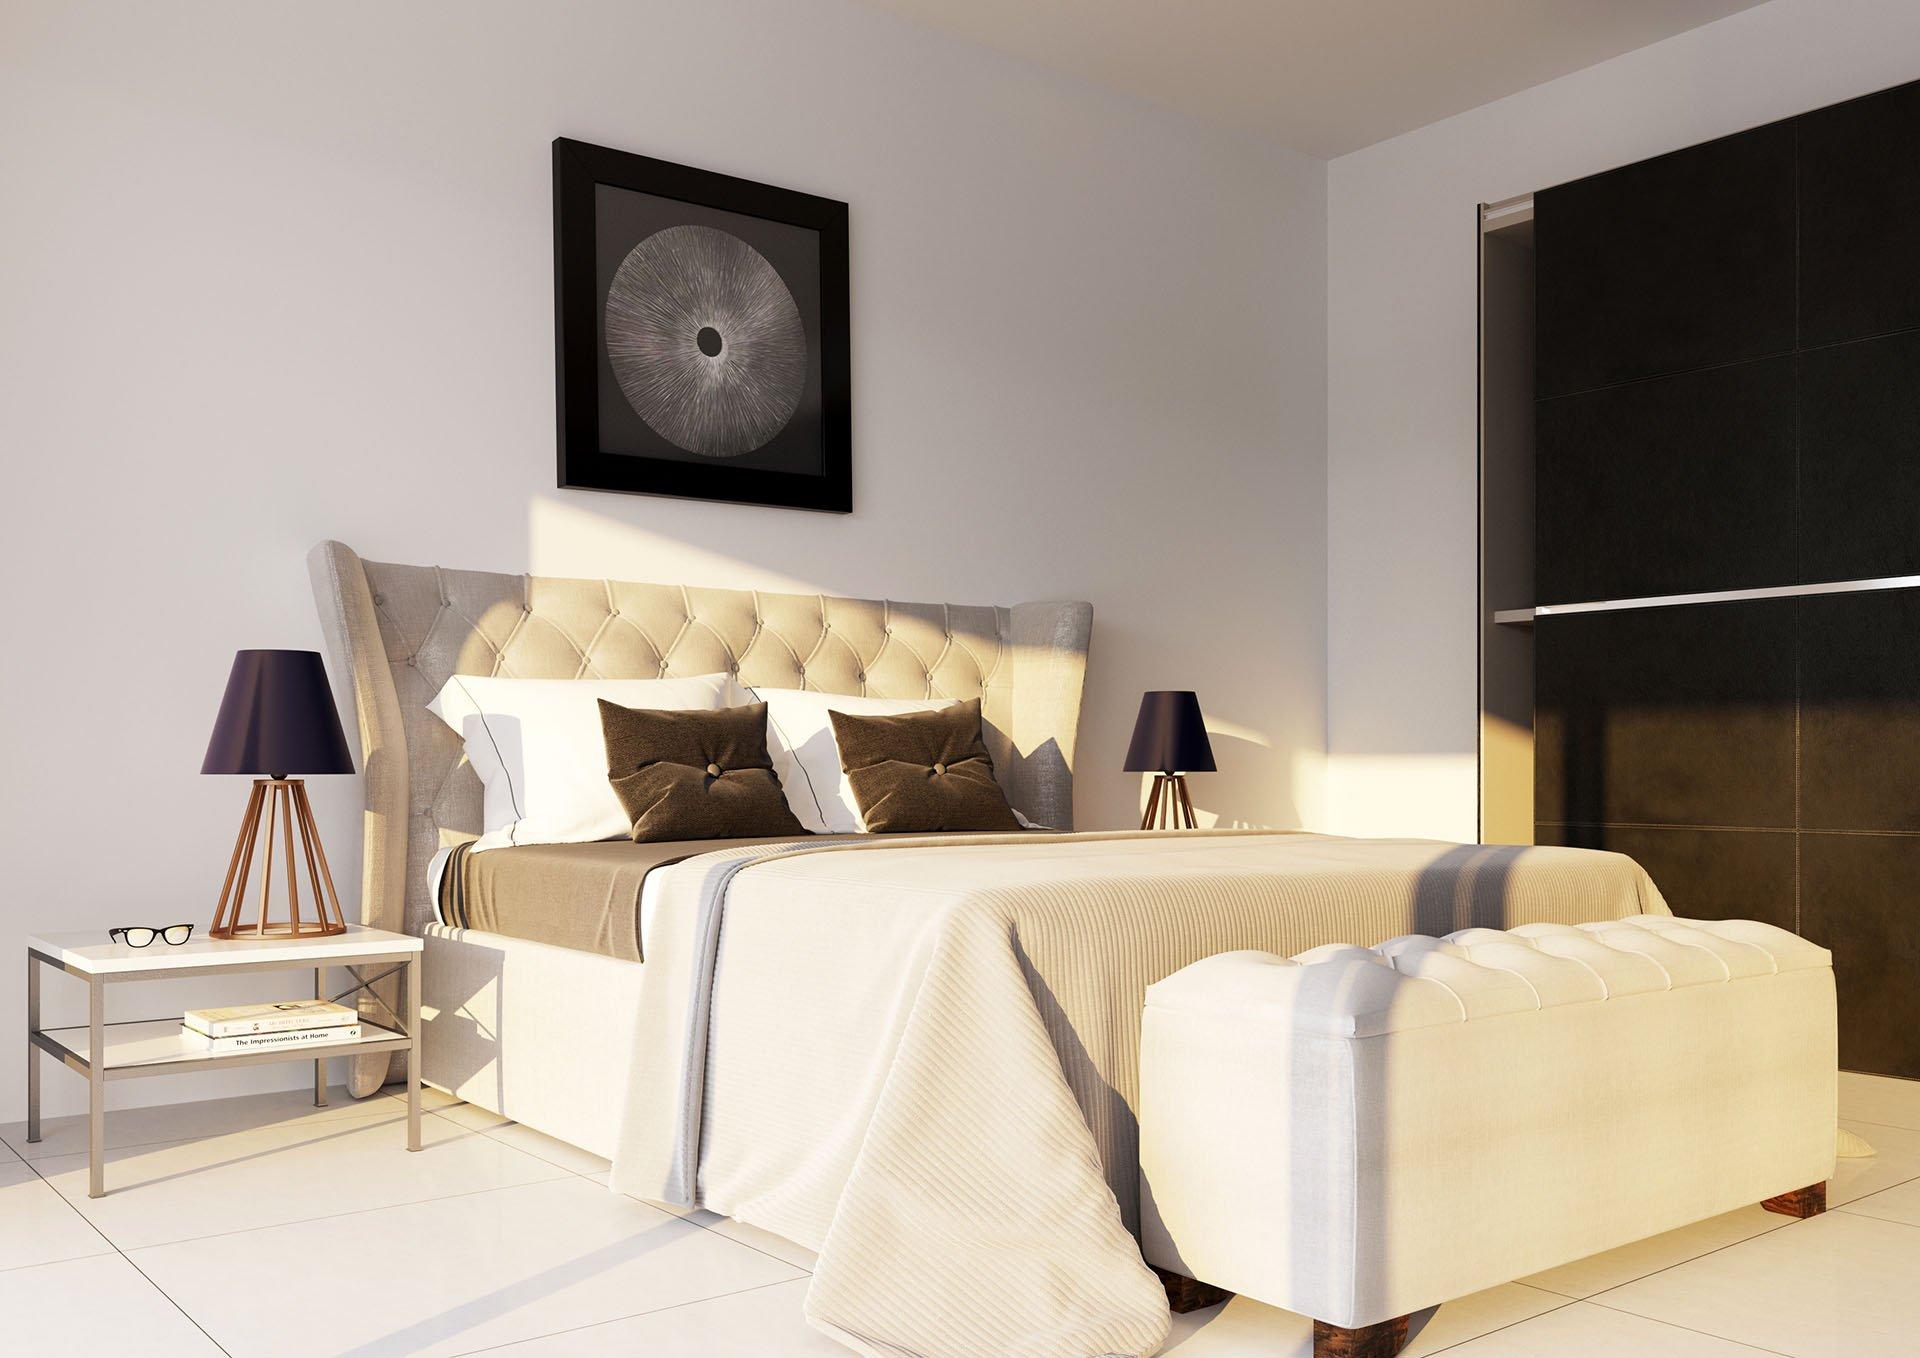 Los Olivos: Modern villas in a highly demanded residential area in Marbella